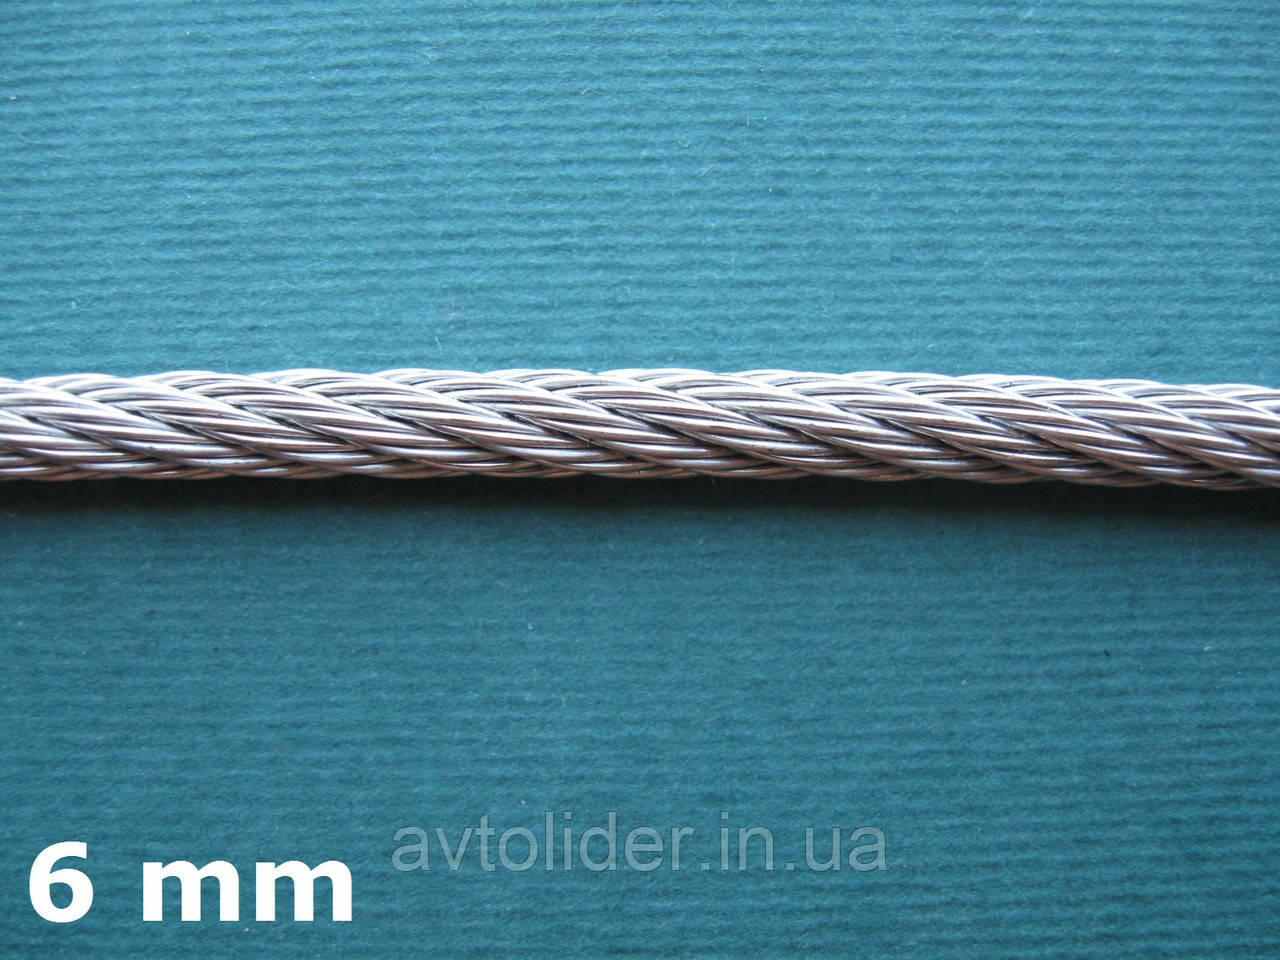 Нержавеющий трос А4, плетение 7х7, диаметр 6 мм